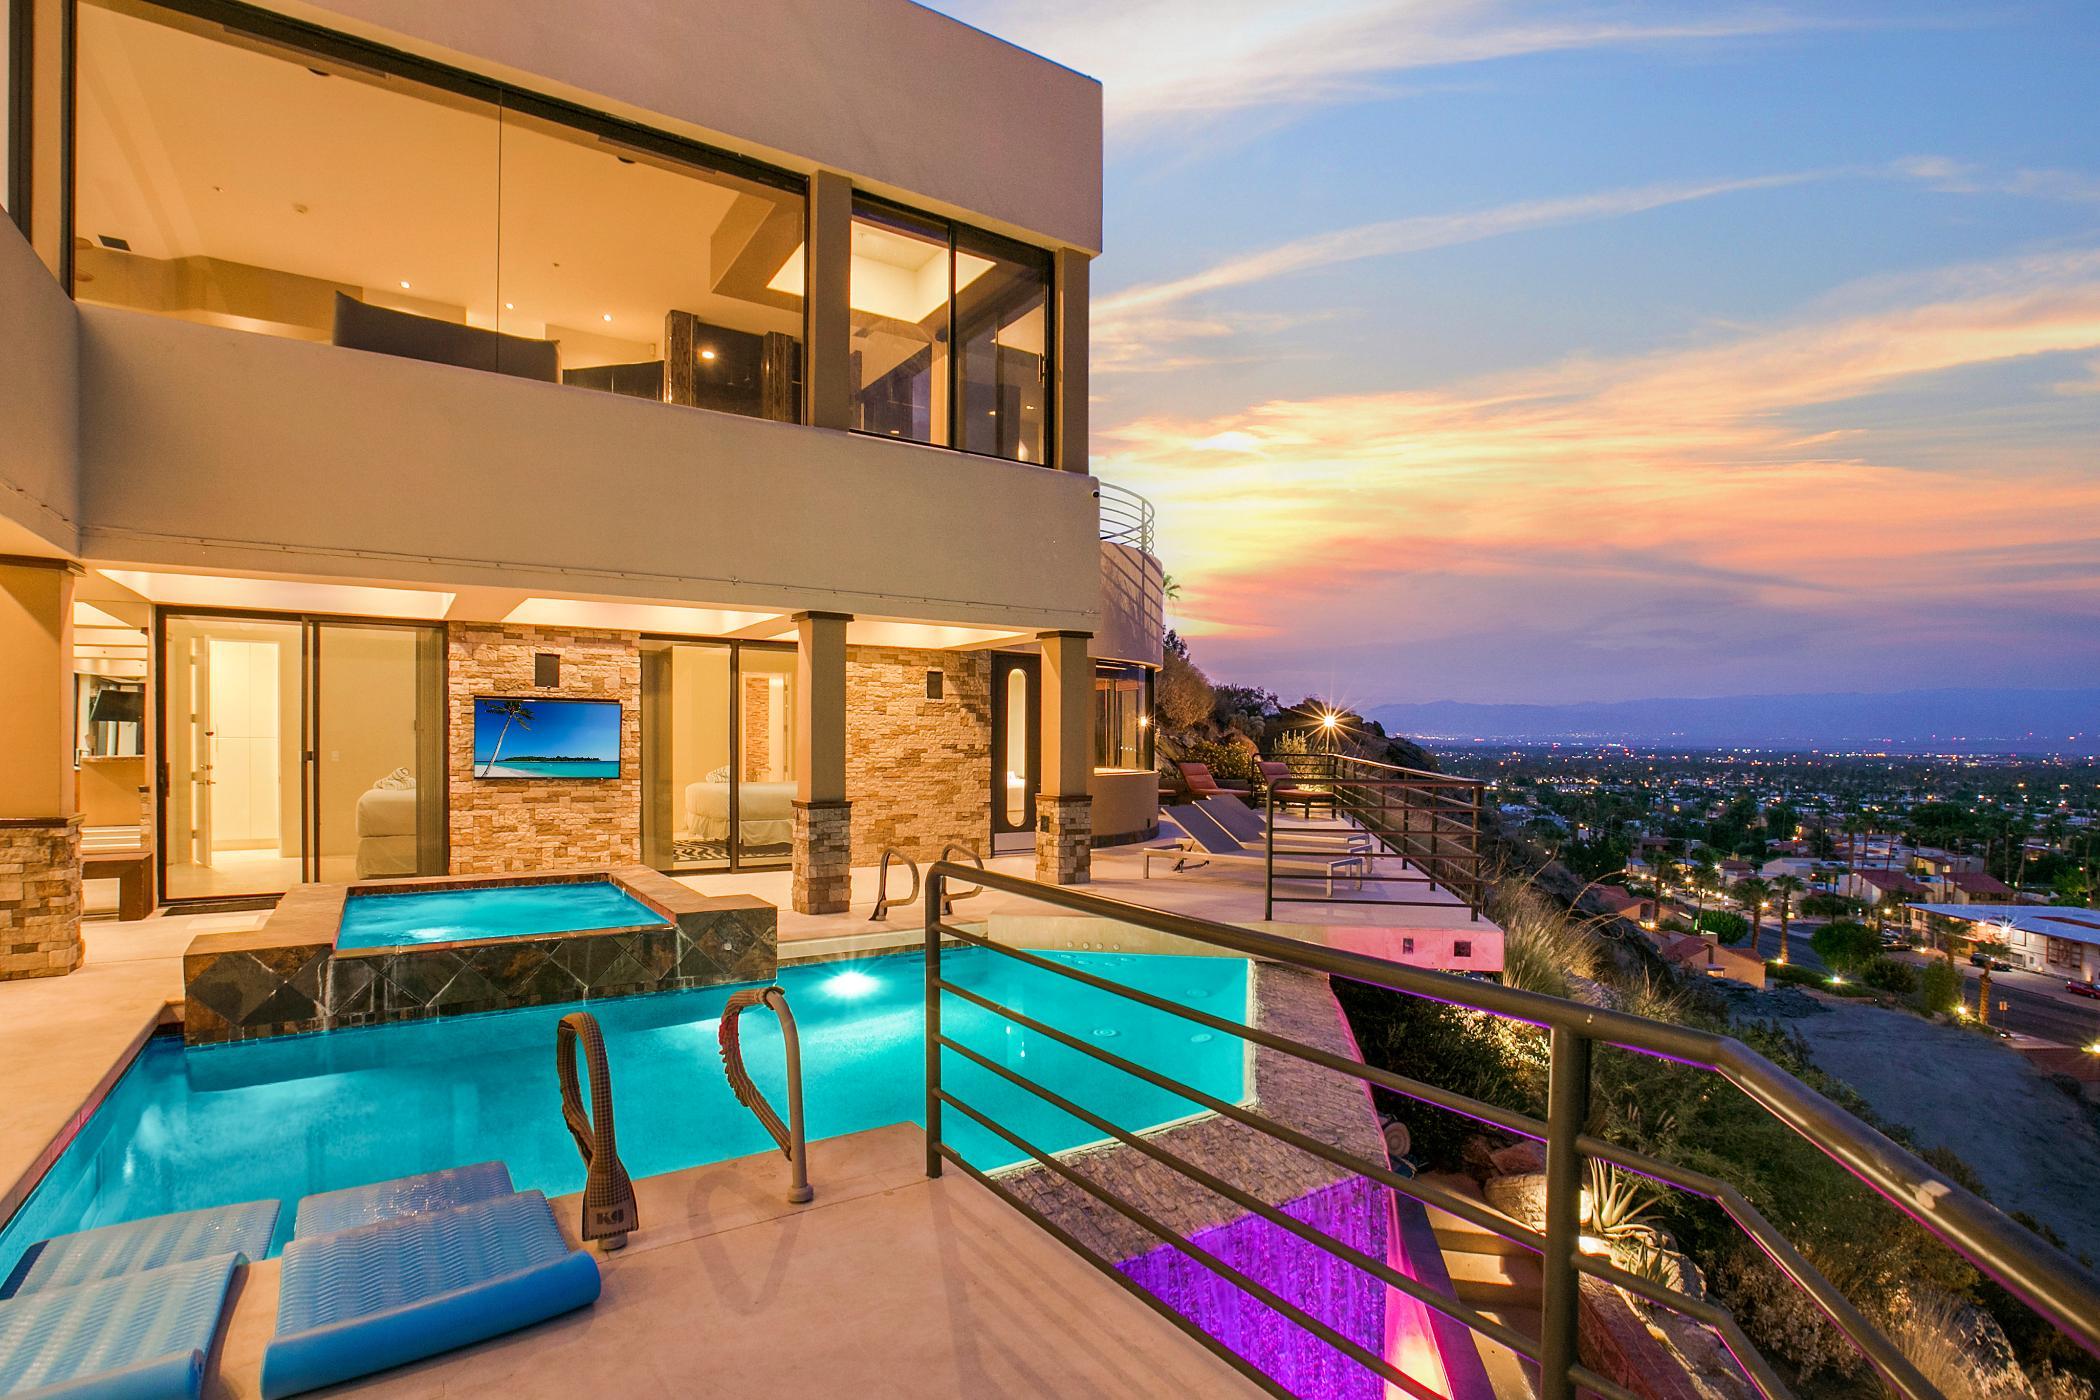 Best Kitchen Gallery: Goldeneye Estate Villaway® of Villas In California on rachelxblog.com